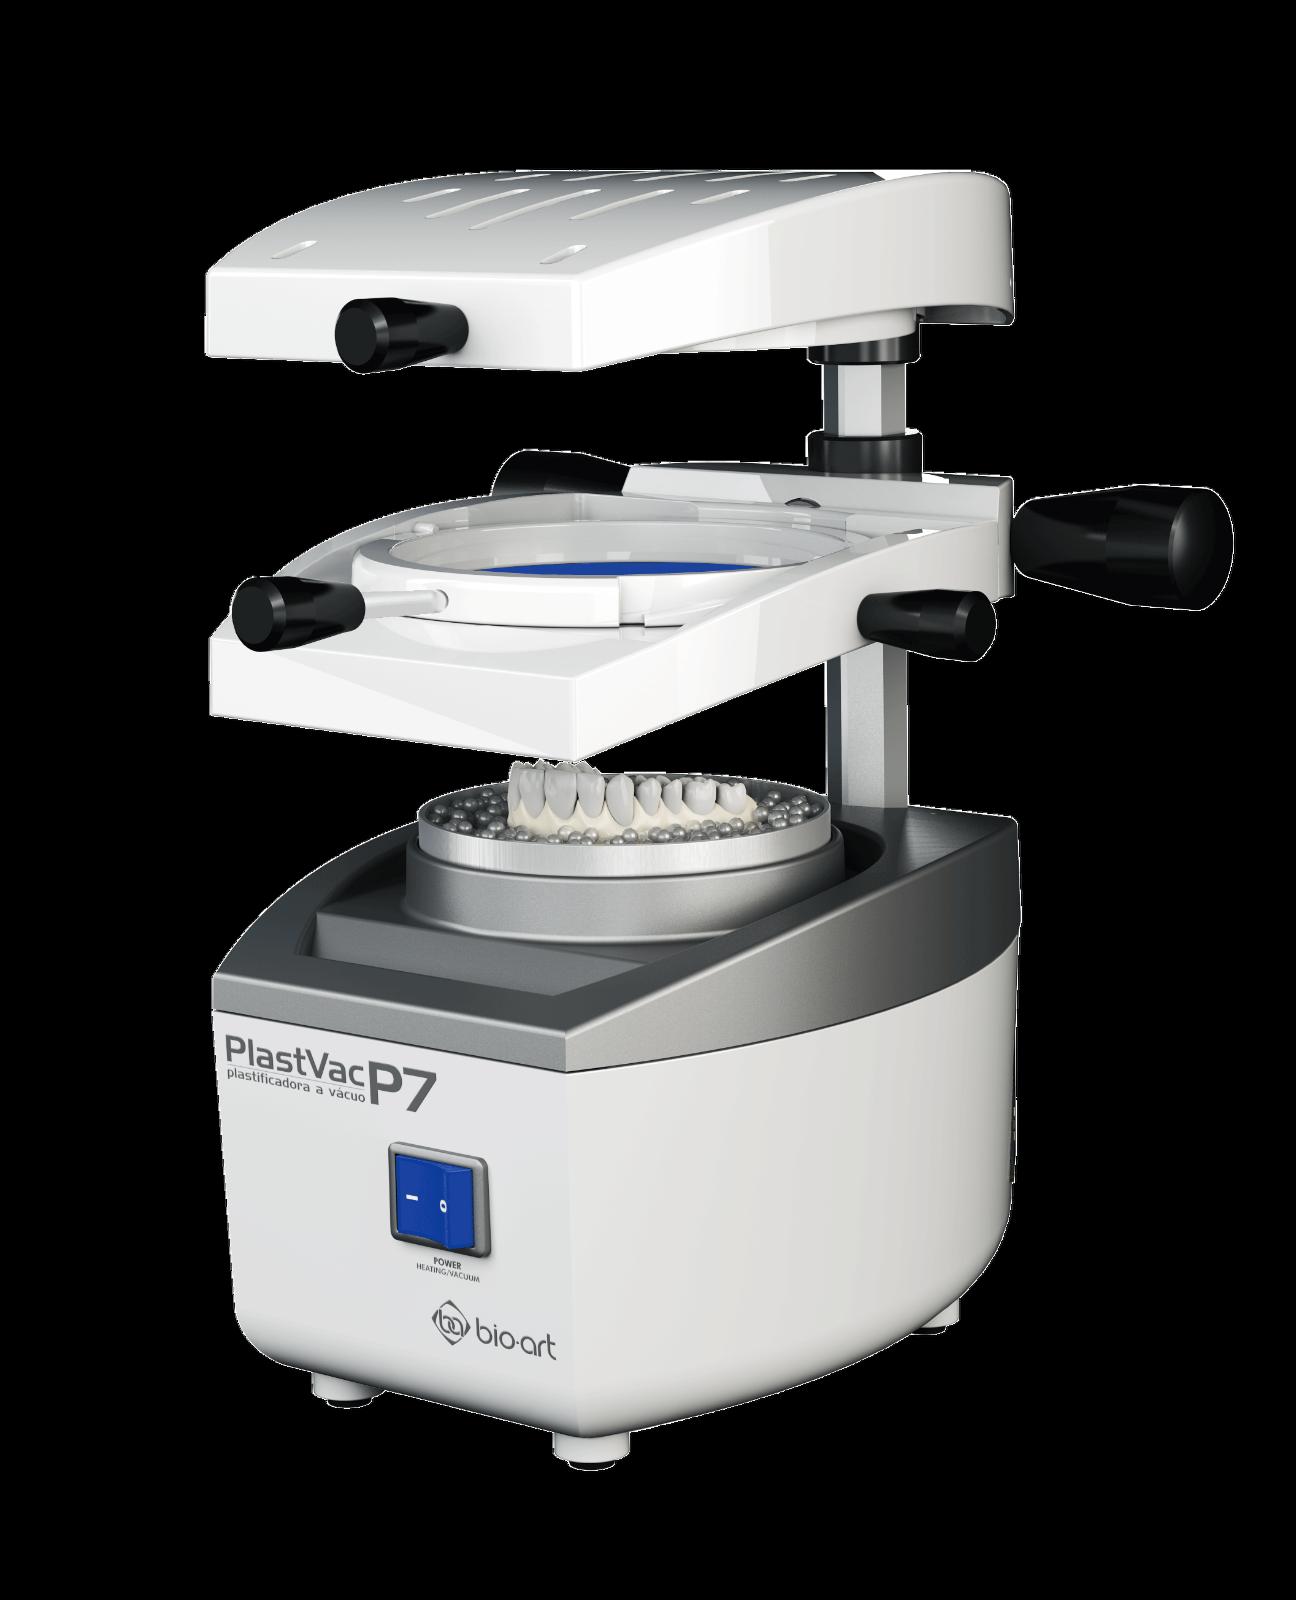 Details about BIOART 110v 220v Dental Lab Vacuum Model Forming Machine  PLASTVAC-P7